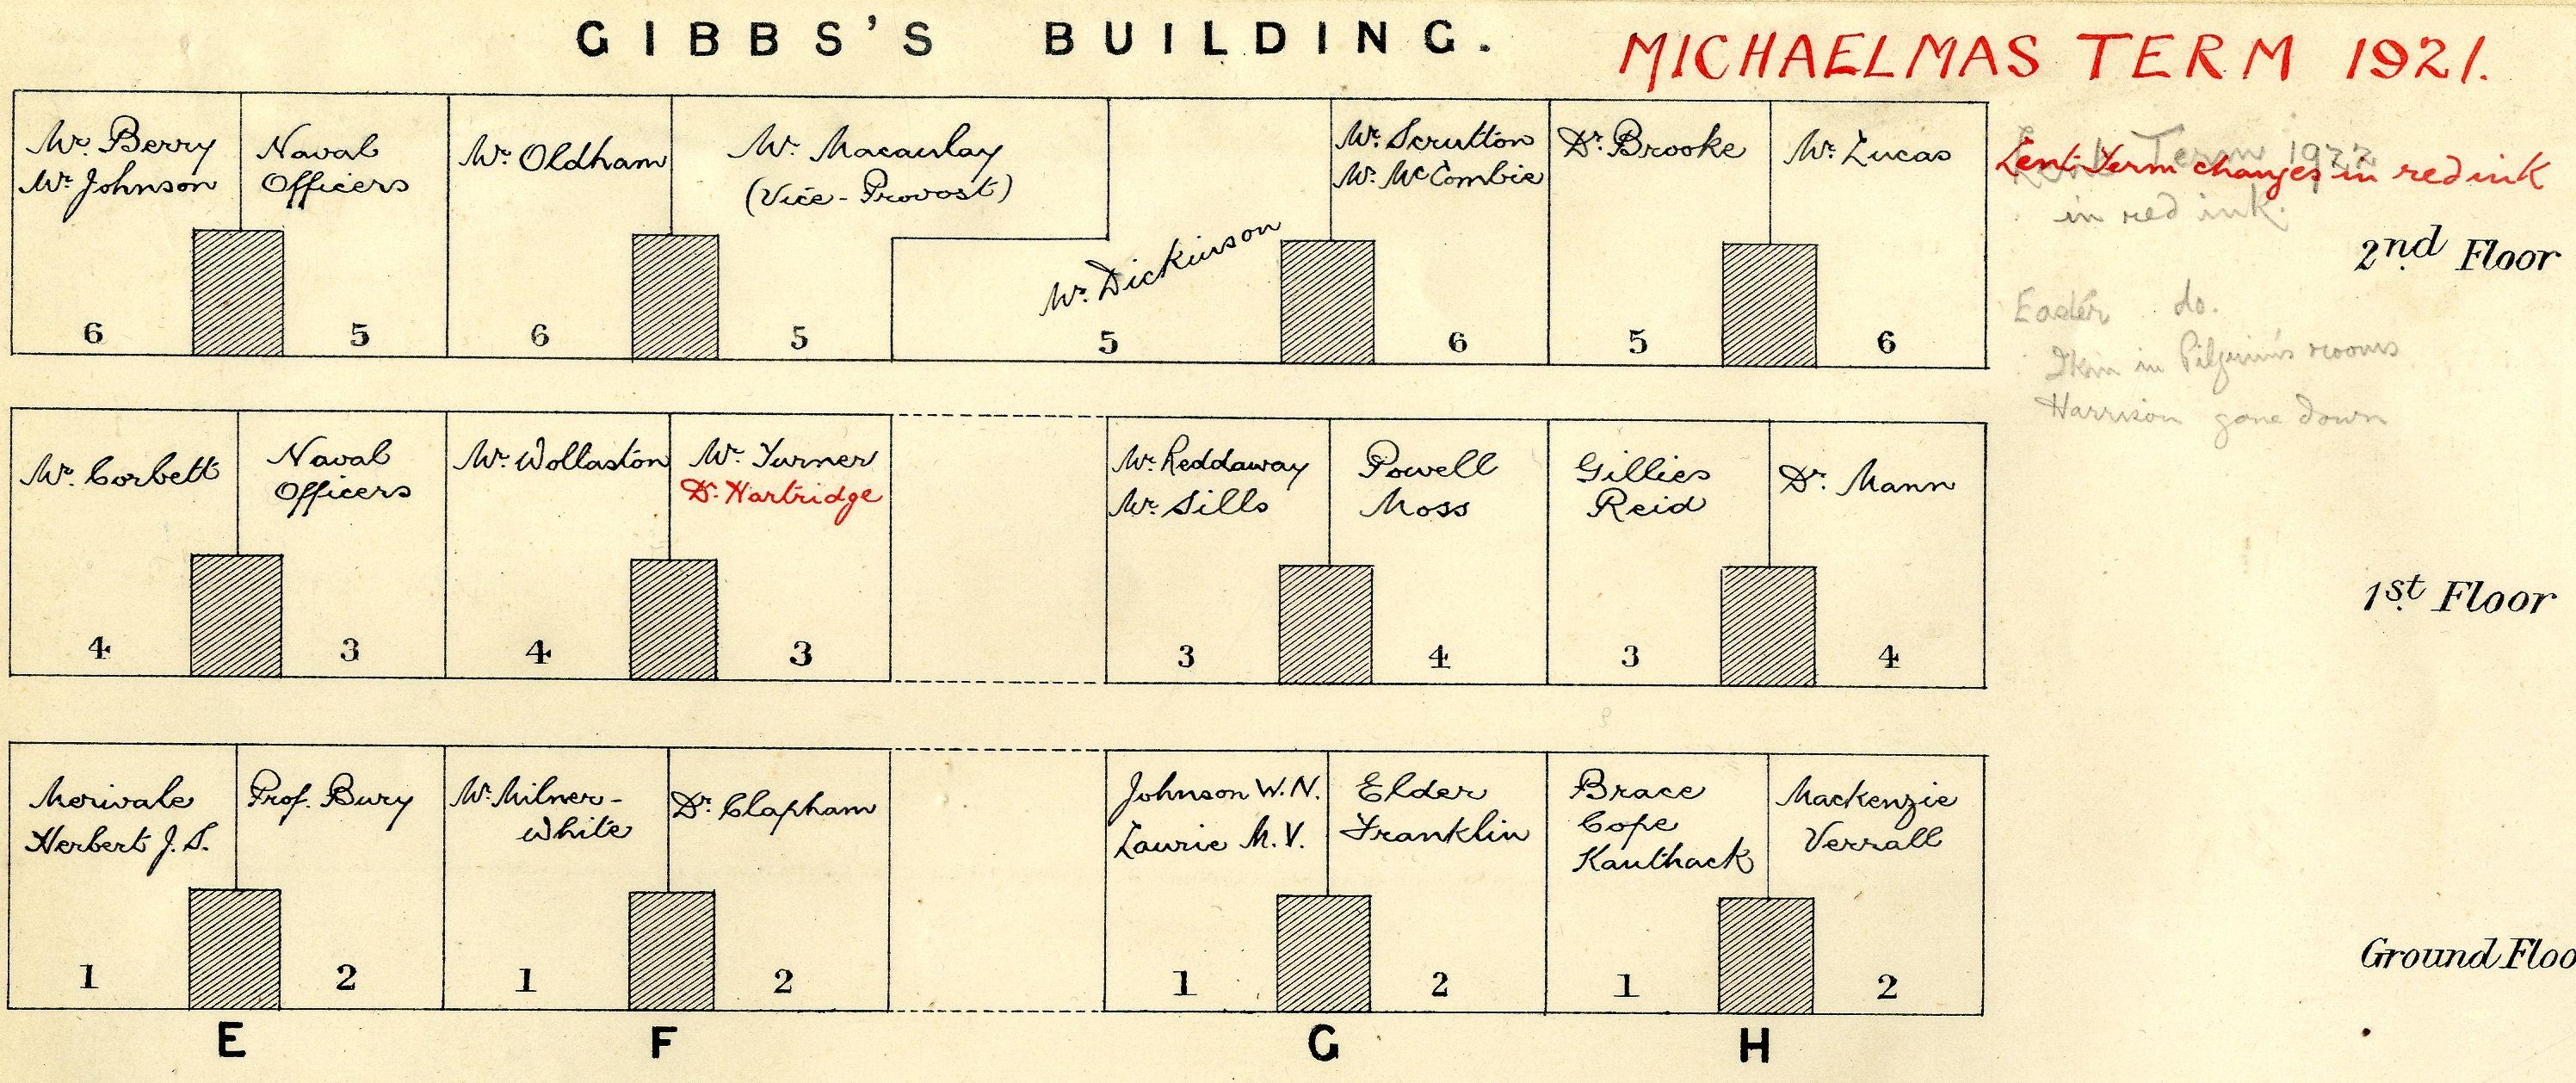 Floor plan, Michaelmas term 1921, showing naval officers, Dickinson, Hartridge, Wollaston, Mann and Milner-White. [KCAC/1/3/2/1]